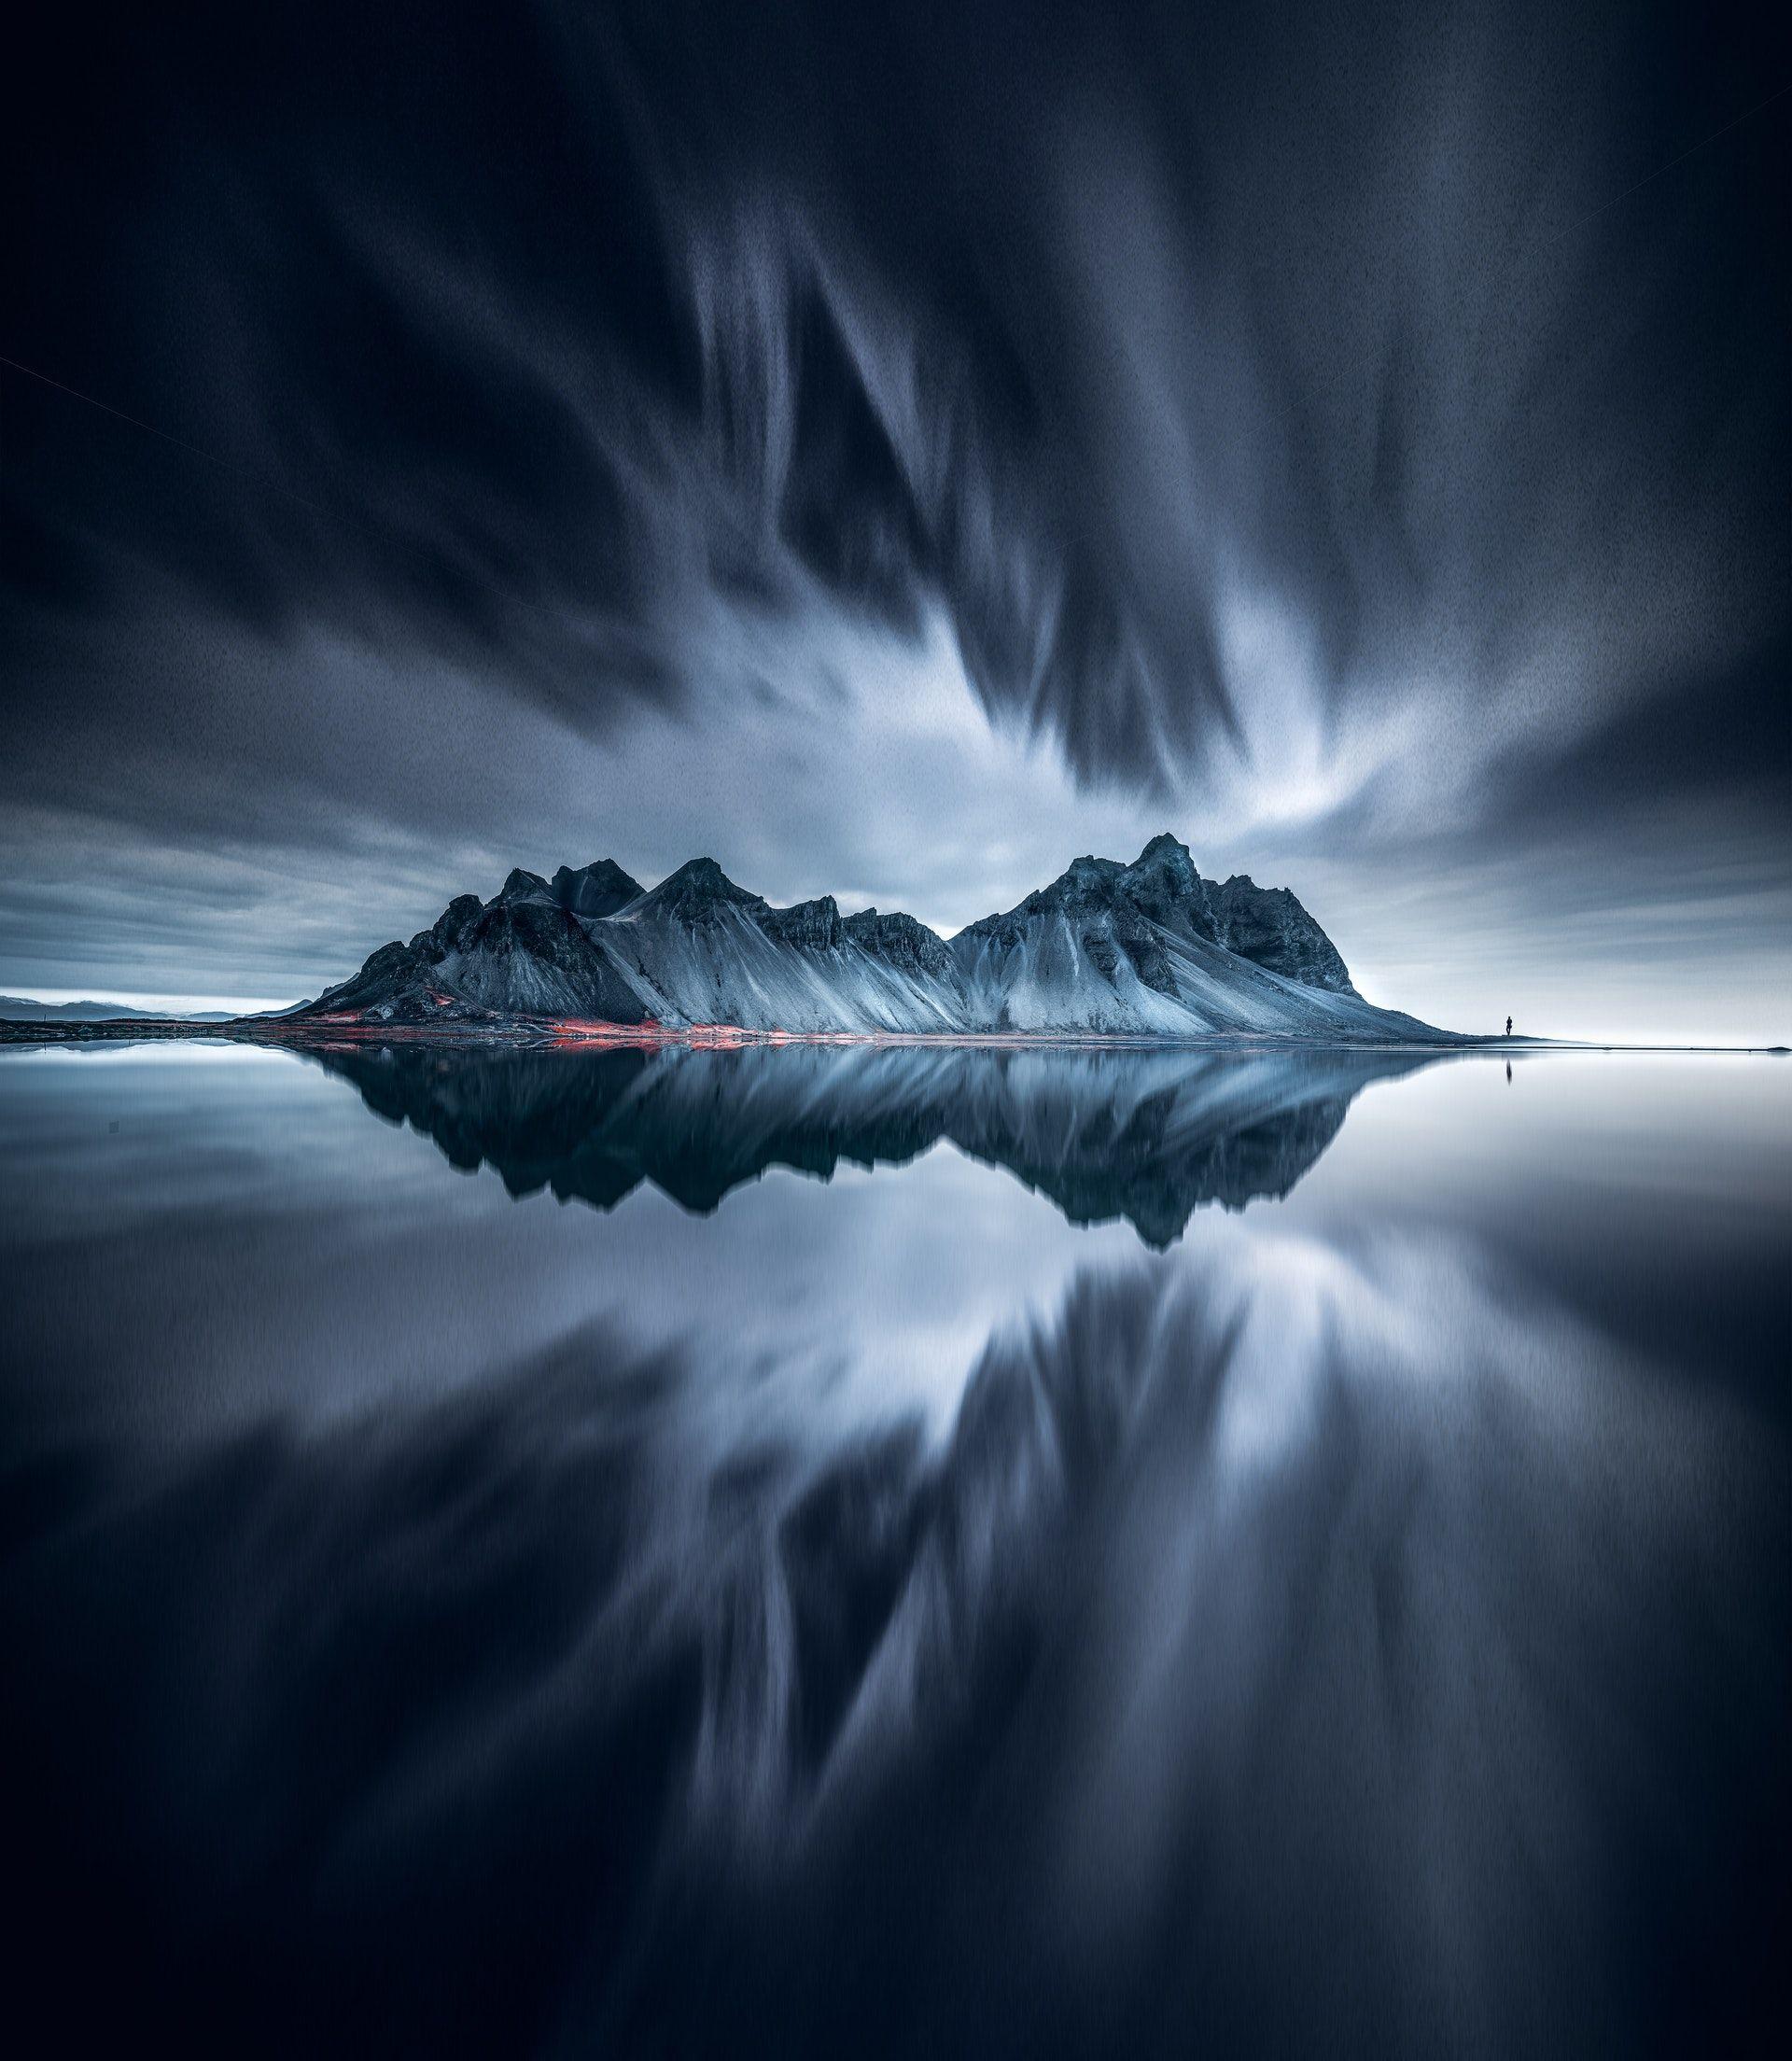 عکس زمینه کوه یخ در بدن از آب پس زمینه